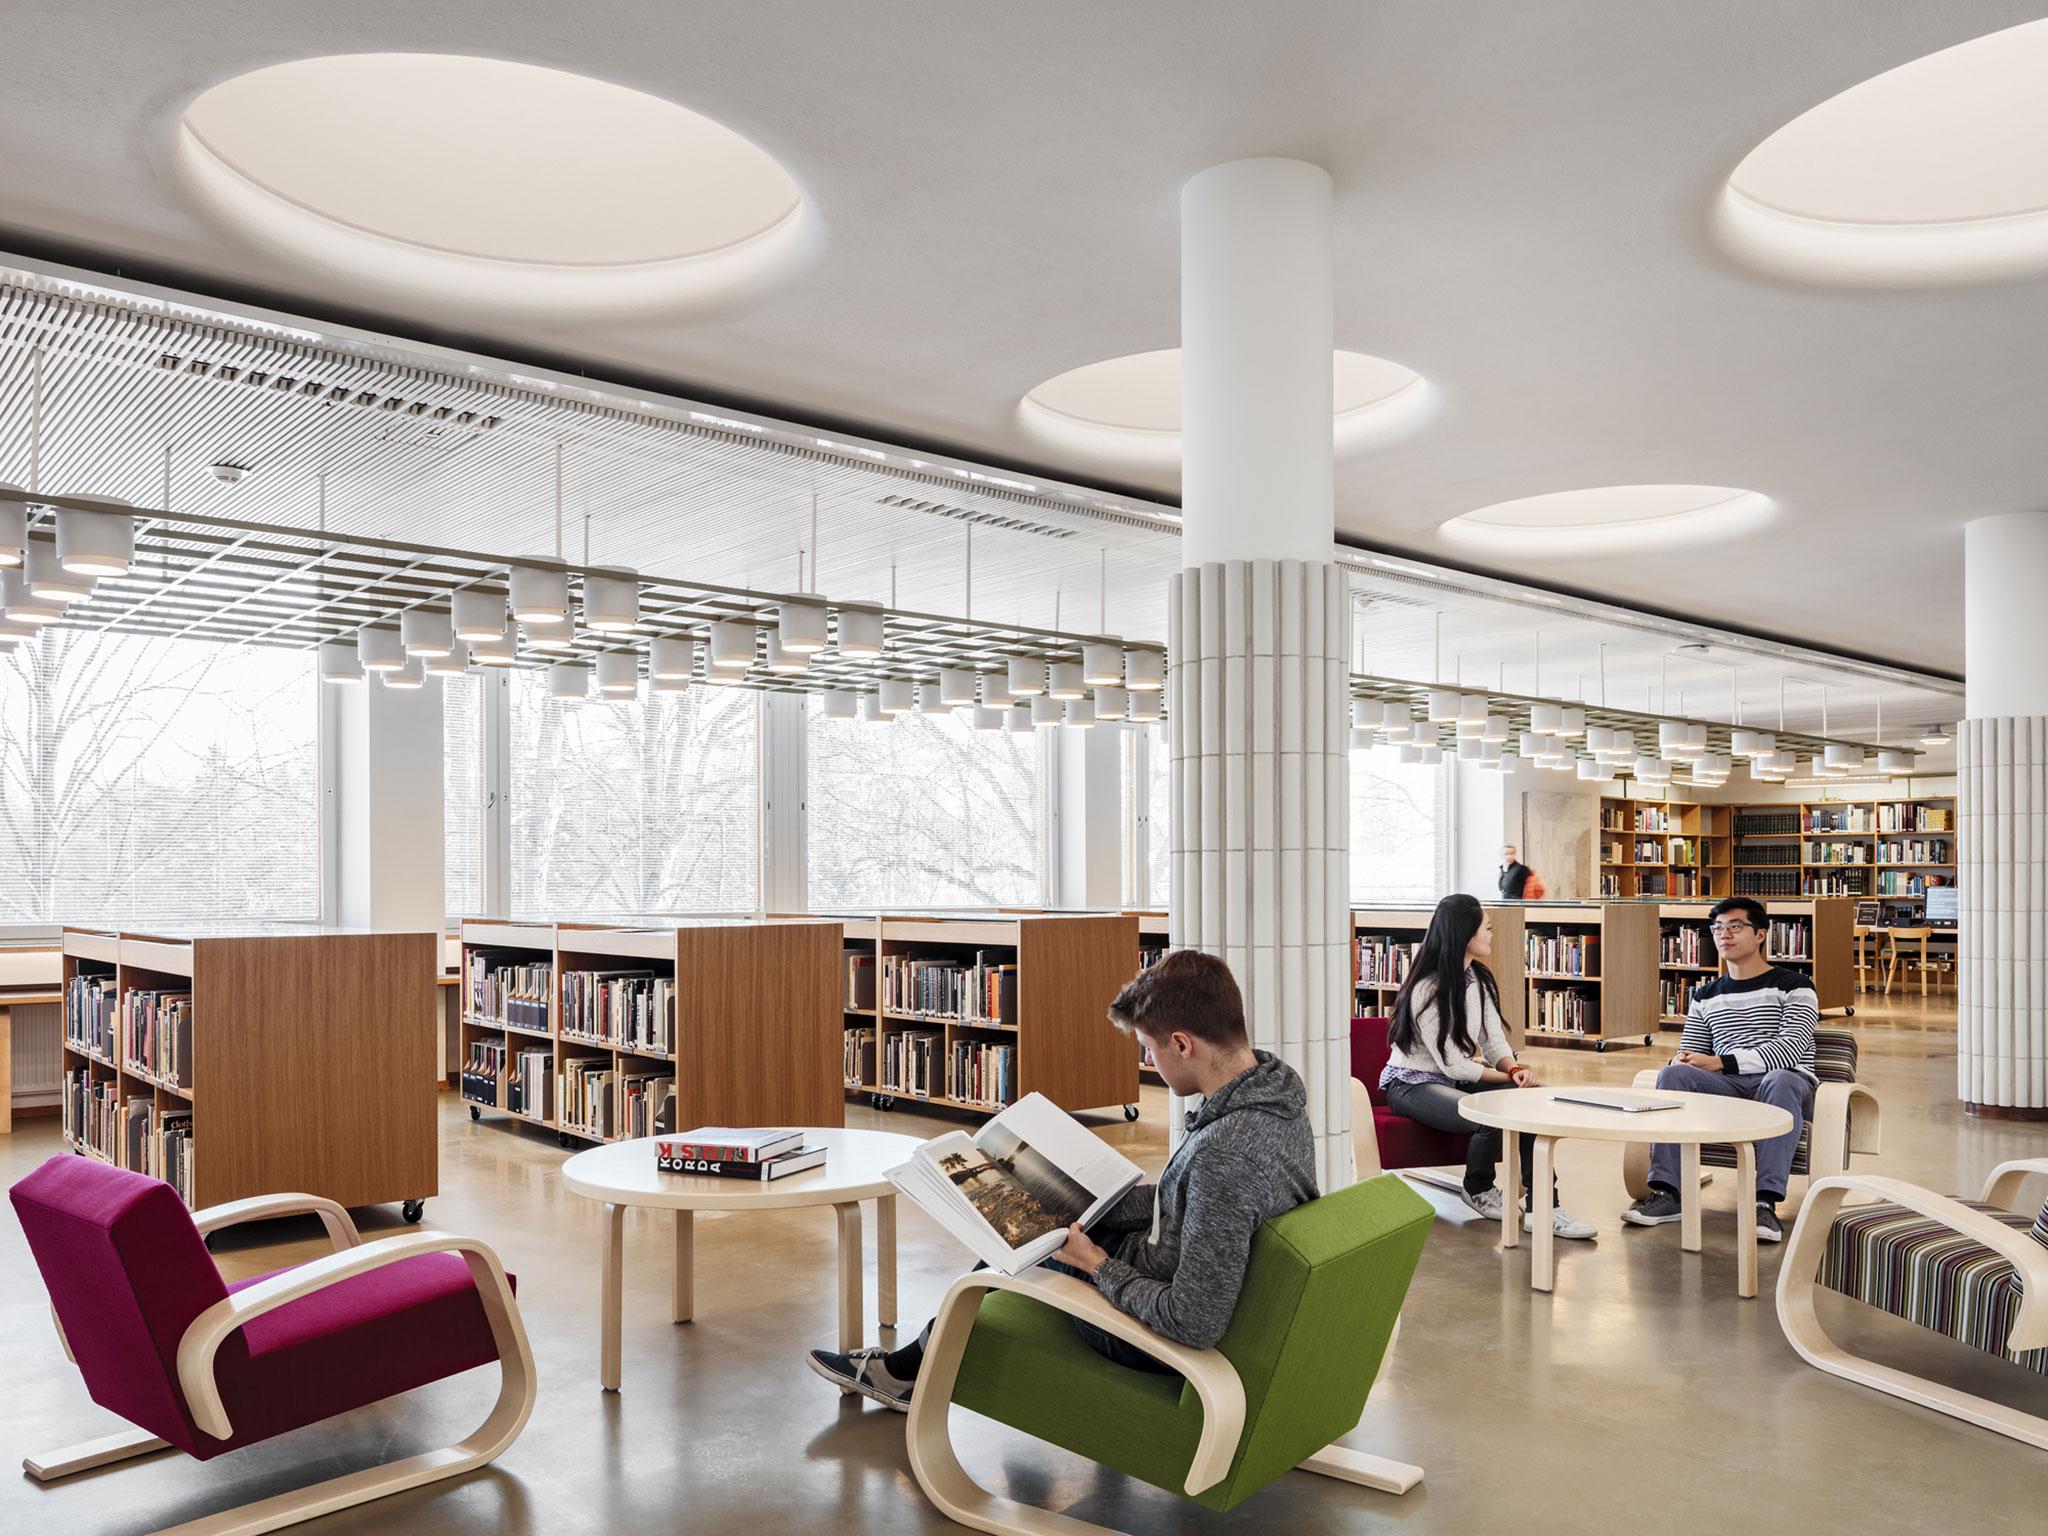 Interior renovation of Aalto University Library, vs Harald Herlin Learning Centre by JKMM ...